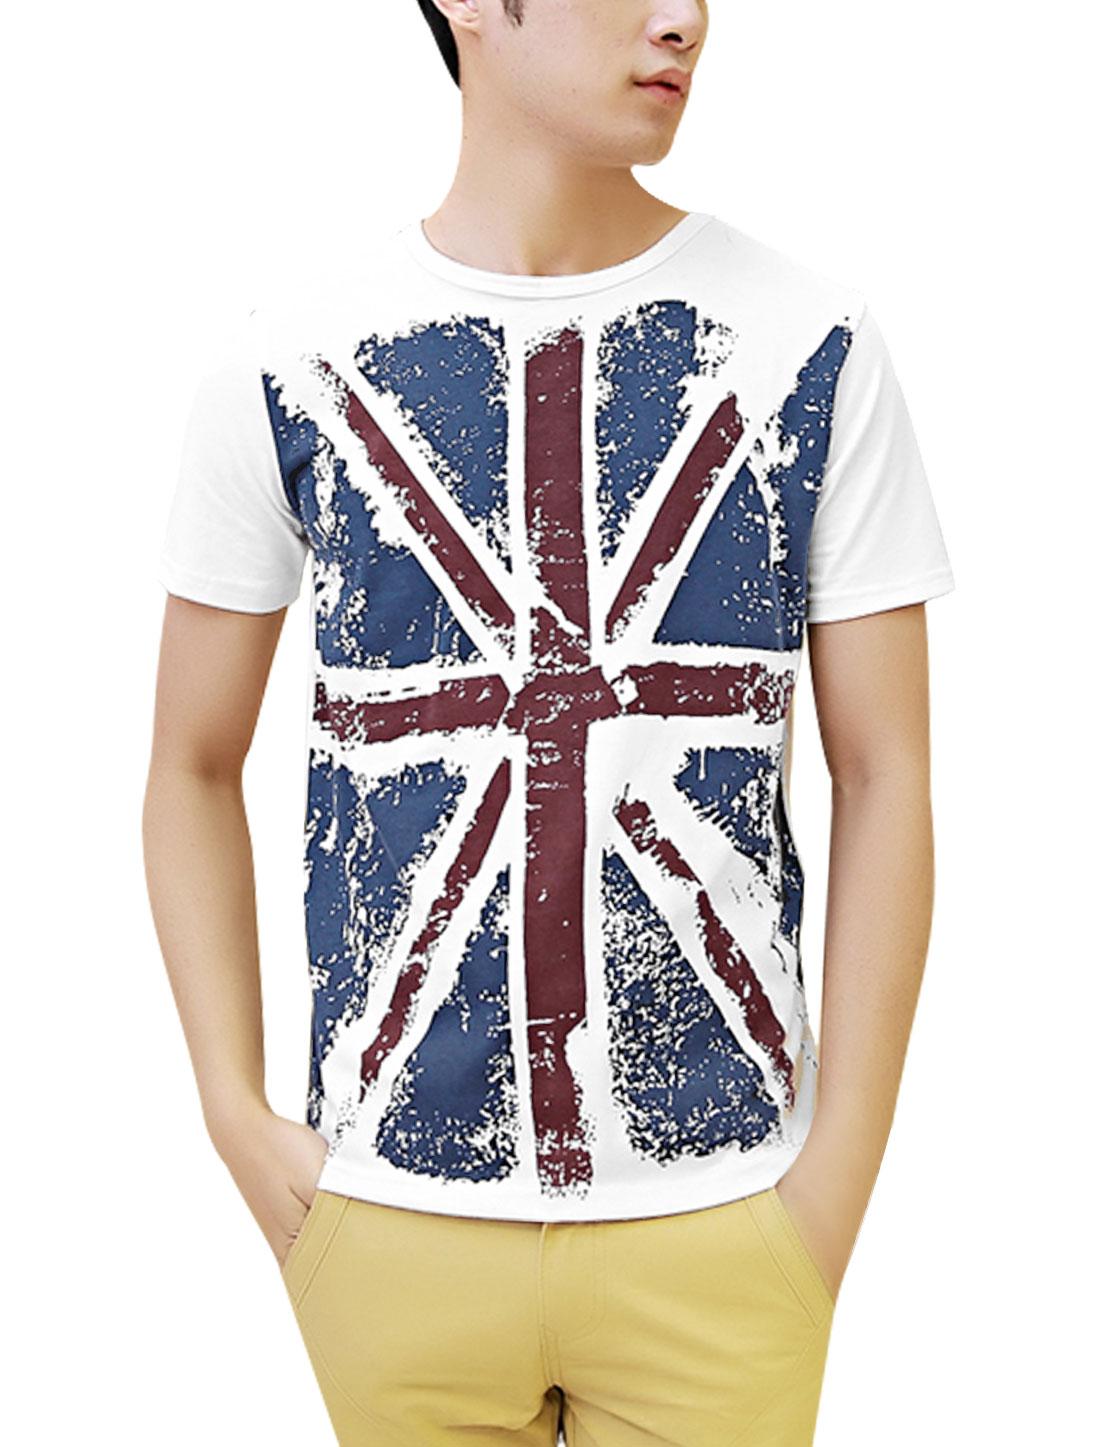 Man Union Jack Print Pullover Short Sleeve Tee Shirt White M